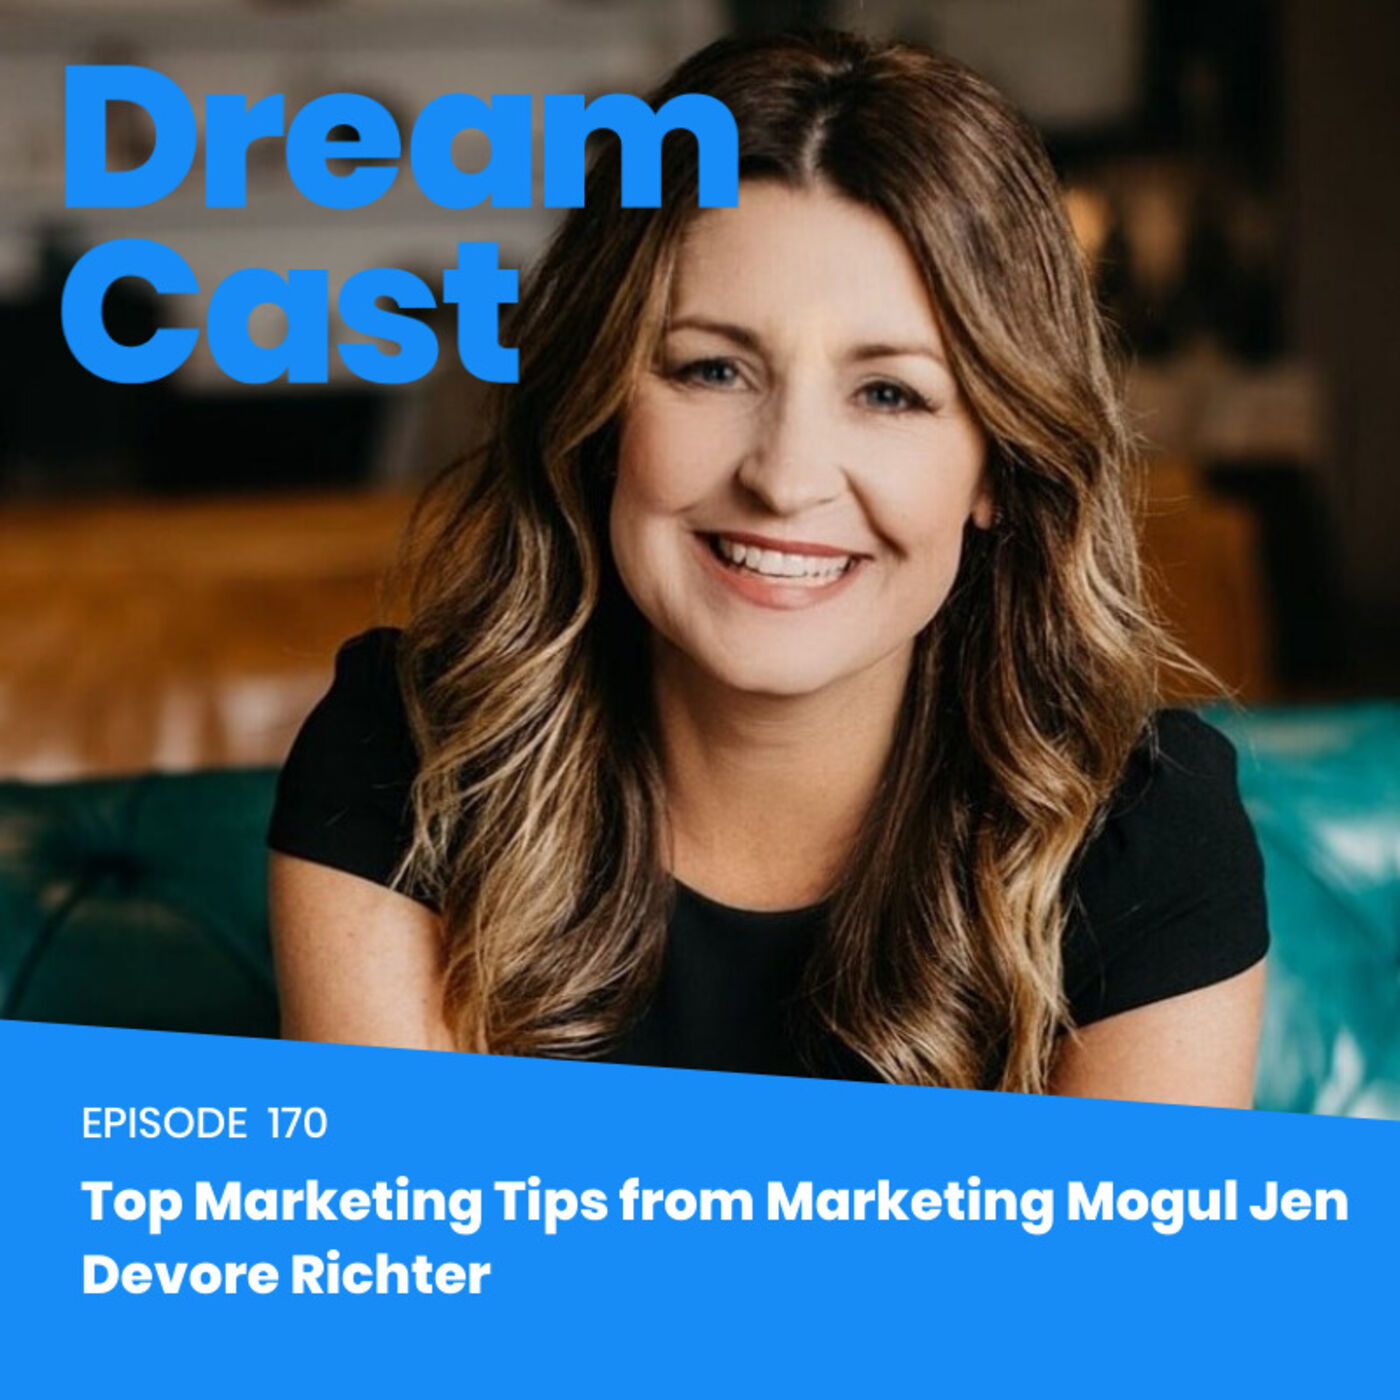 Episode 170 - Top Marketing Tips from Marketing Mogul Jen Devore Richter